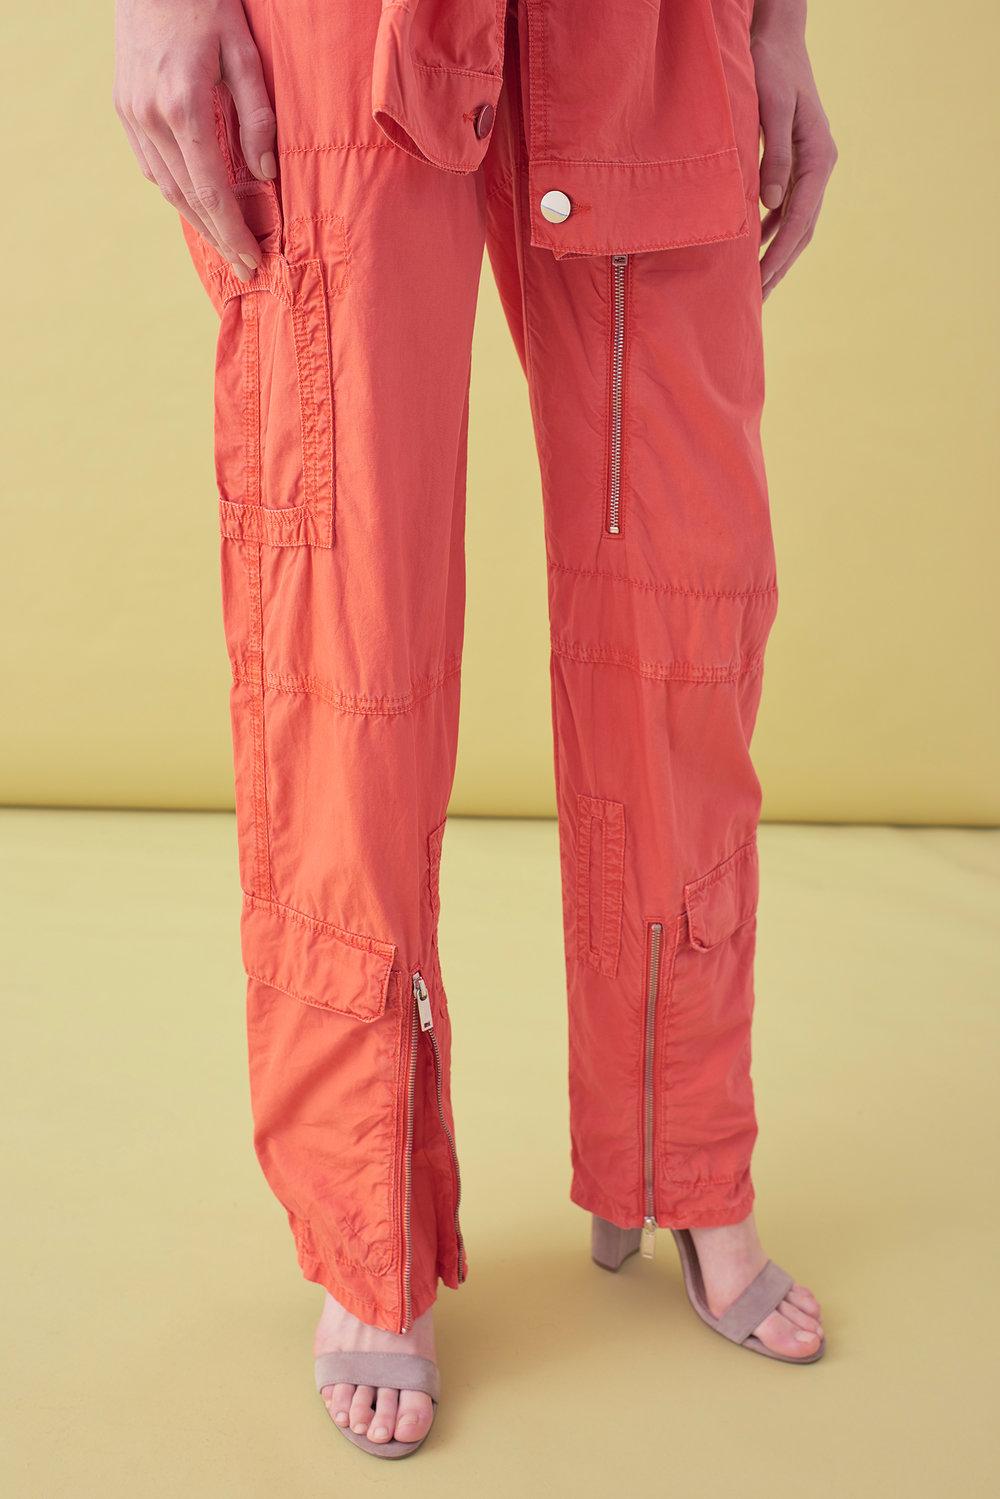 Sarah_Swann_SS17_14_Garment_Dyed_Rayon_Cotton_Utility_Trouser_Coral_D.jpg